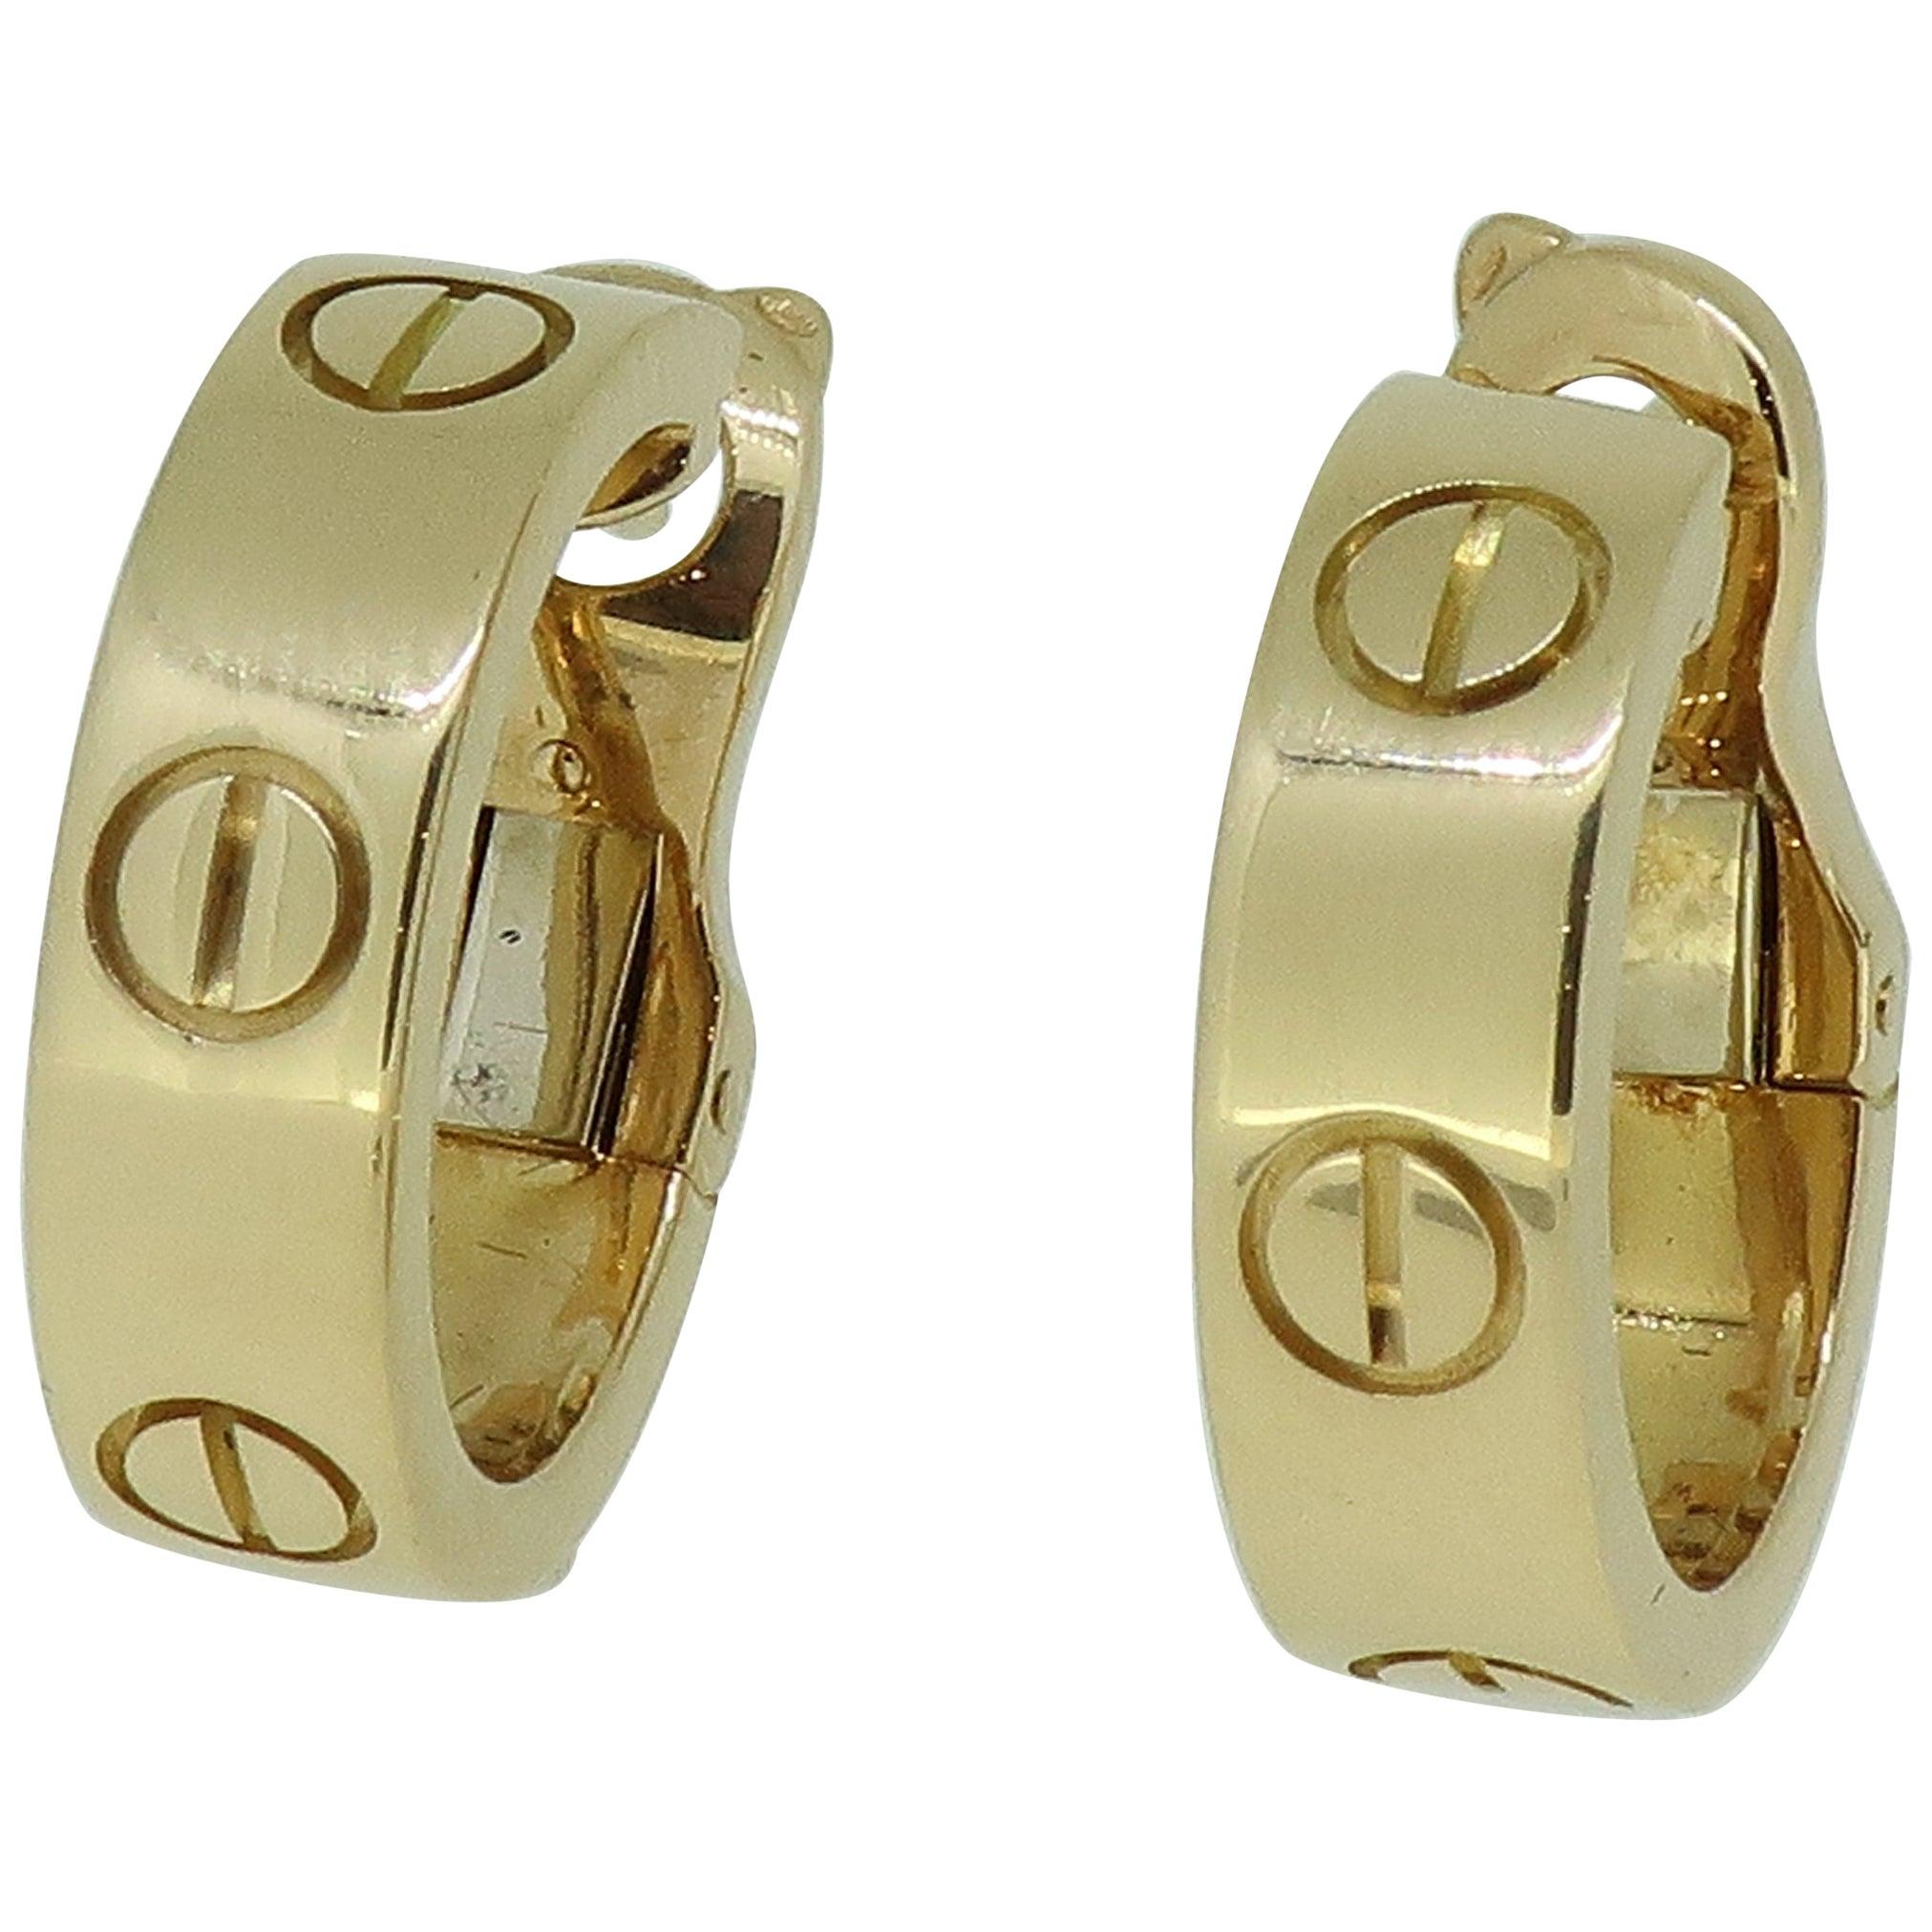 Gold Cartier 'Love' Hoop Earrings 18 Karat Yellow